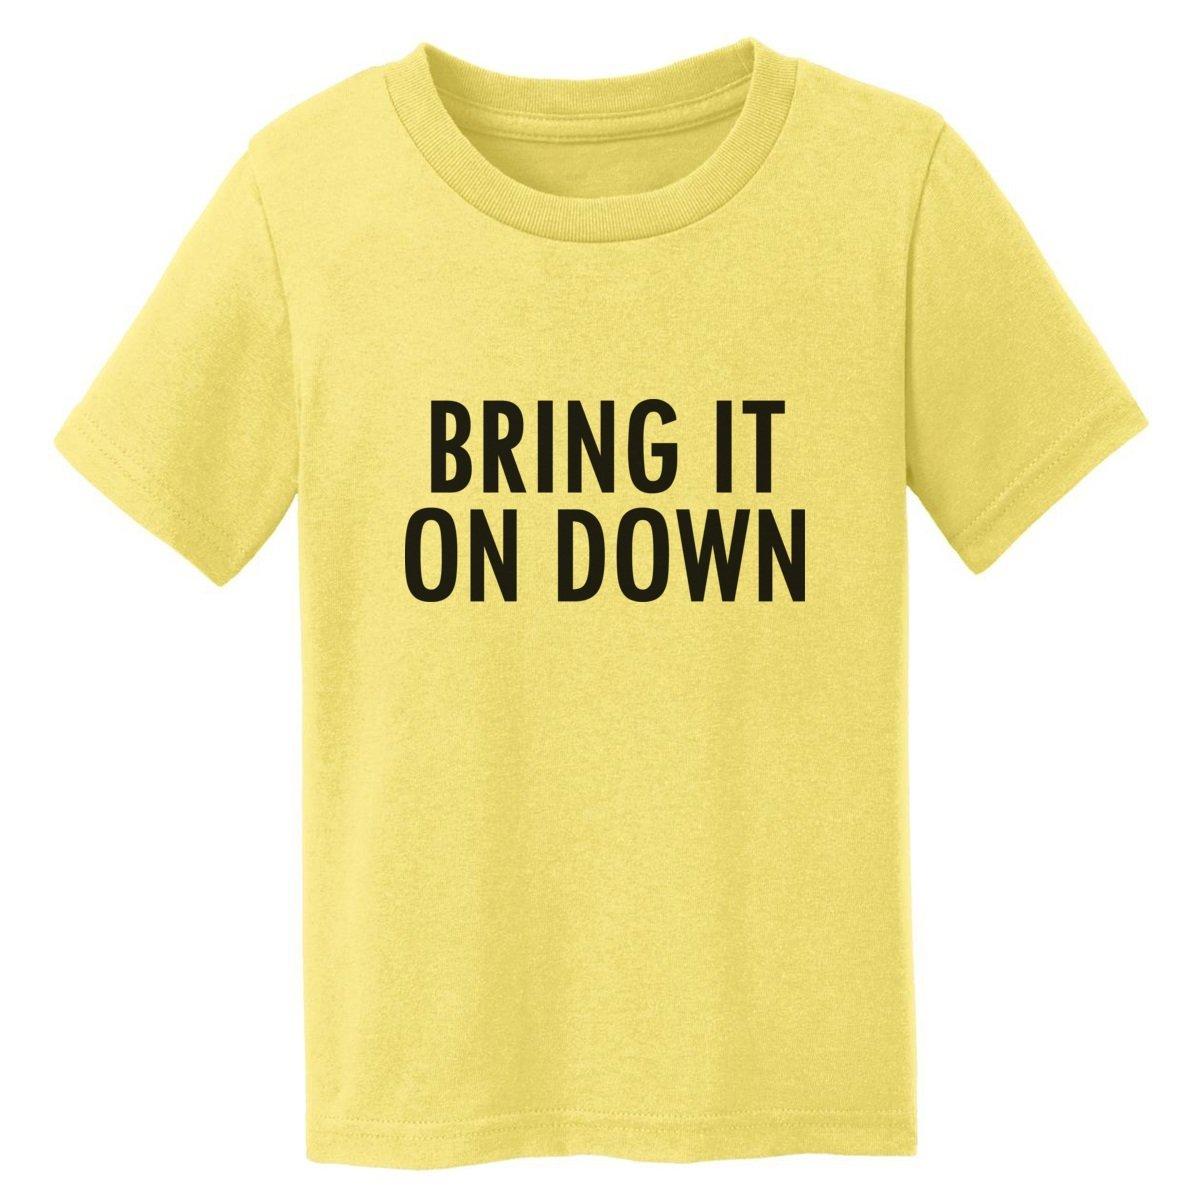 Digital T-Shirt Shop Baby-girls Bring it On Down